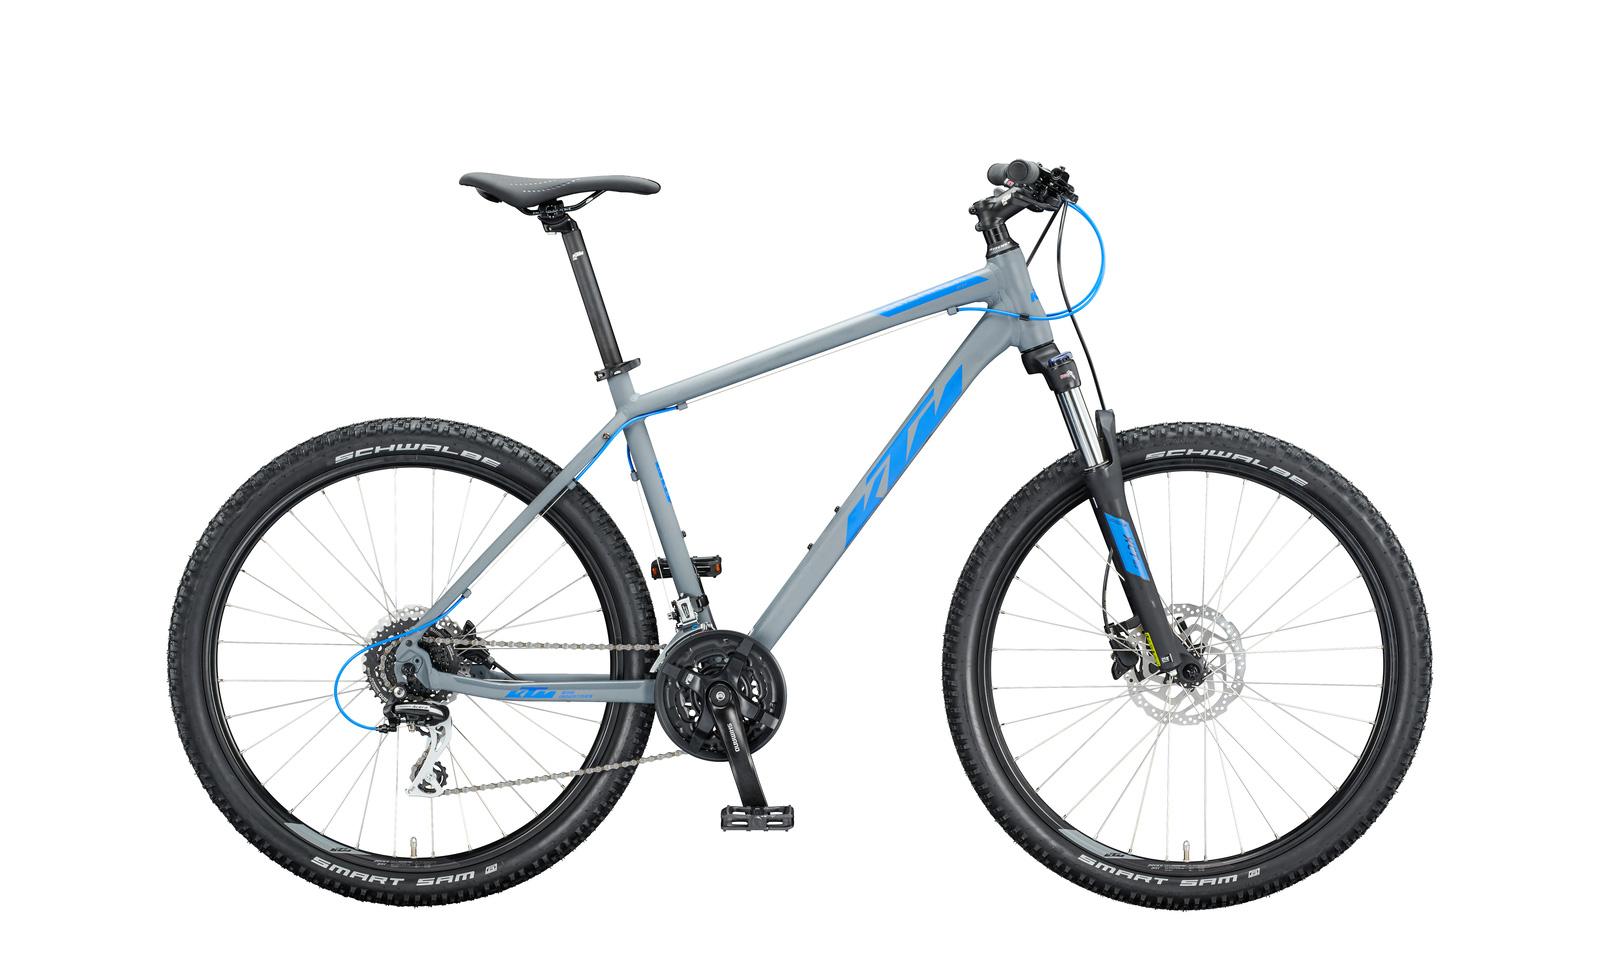 Biciclete KTM MTB Hardtail CHICAGO DISC-H 27.24 3x8 Shimano Acera